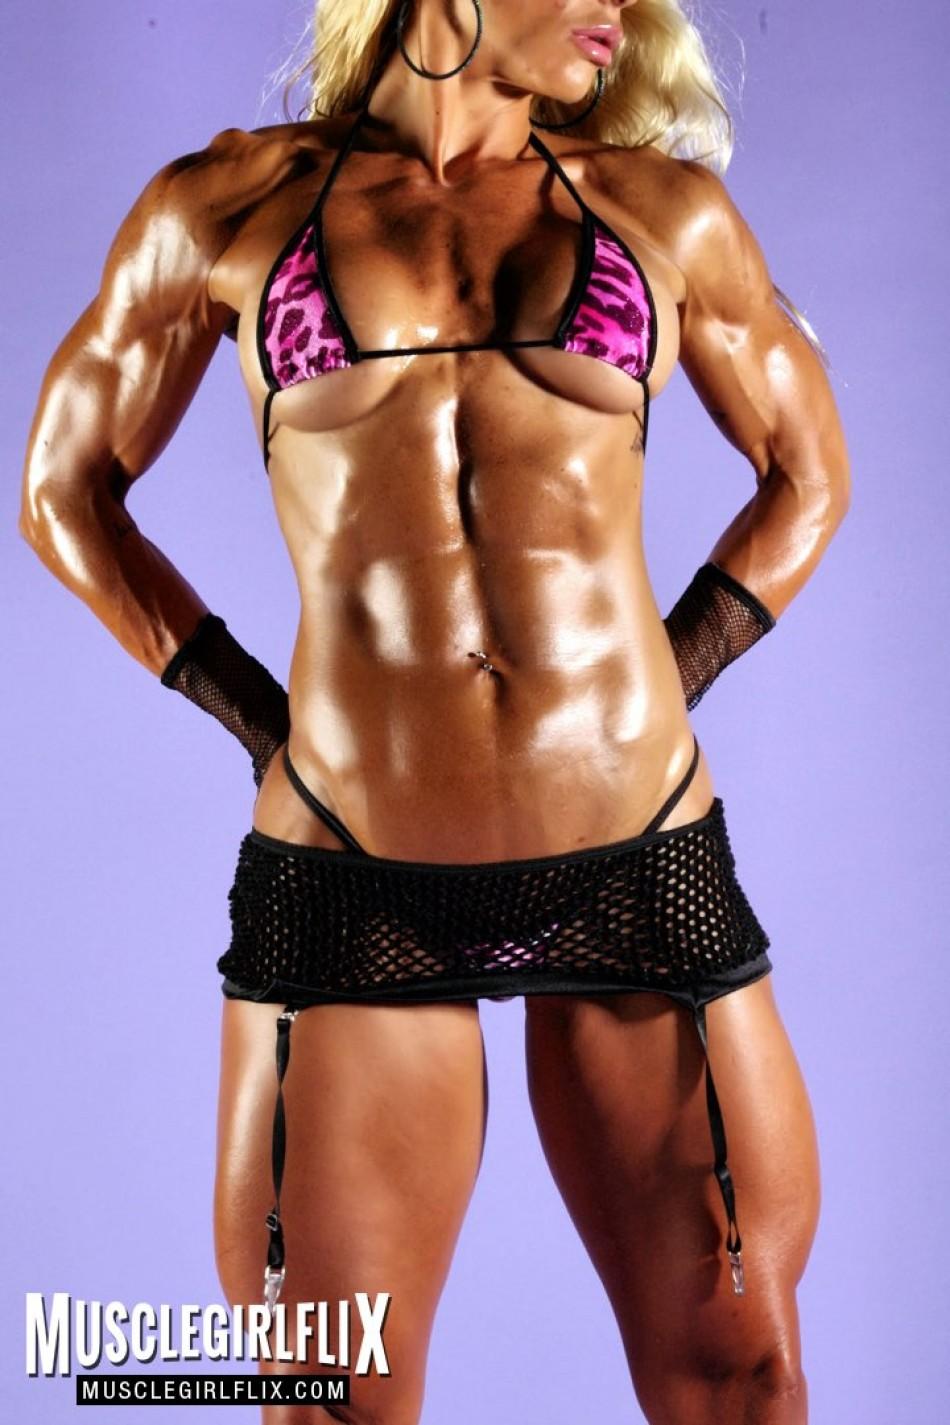 Jill Jaxen thick arms and abs.